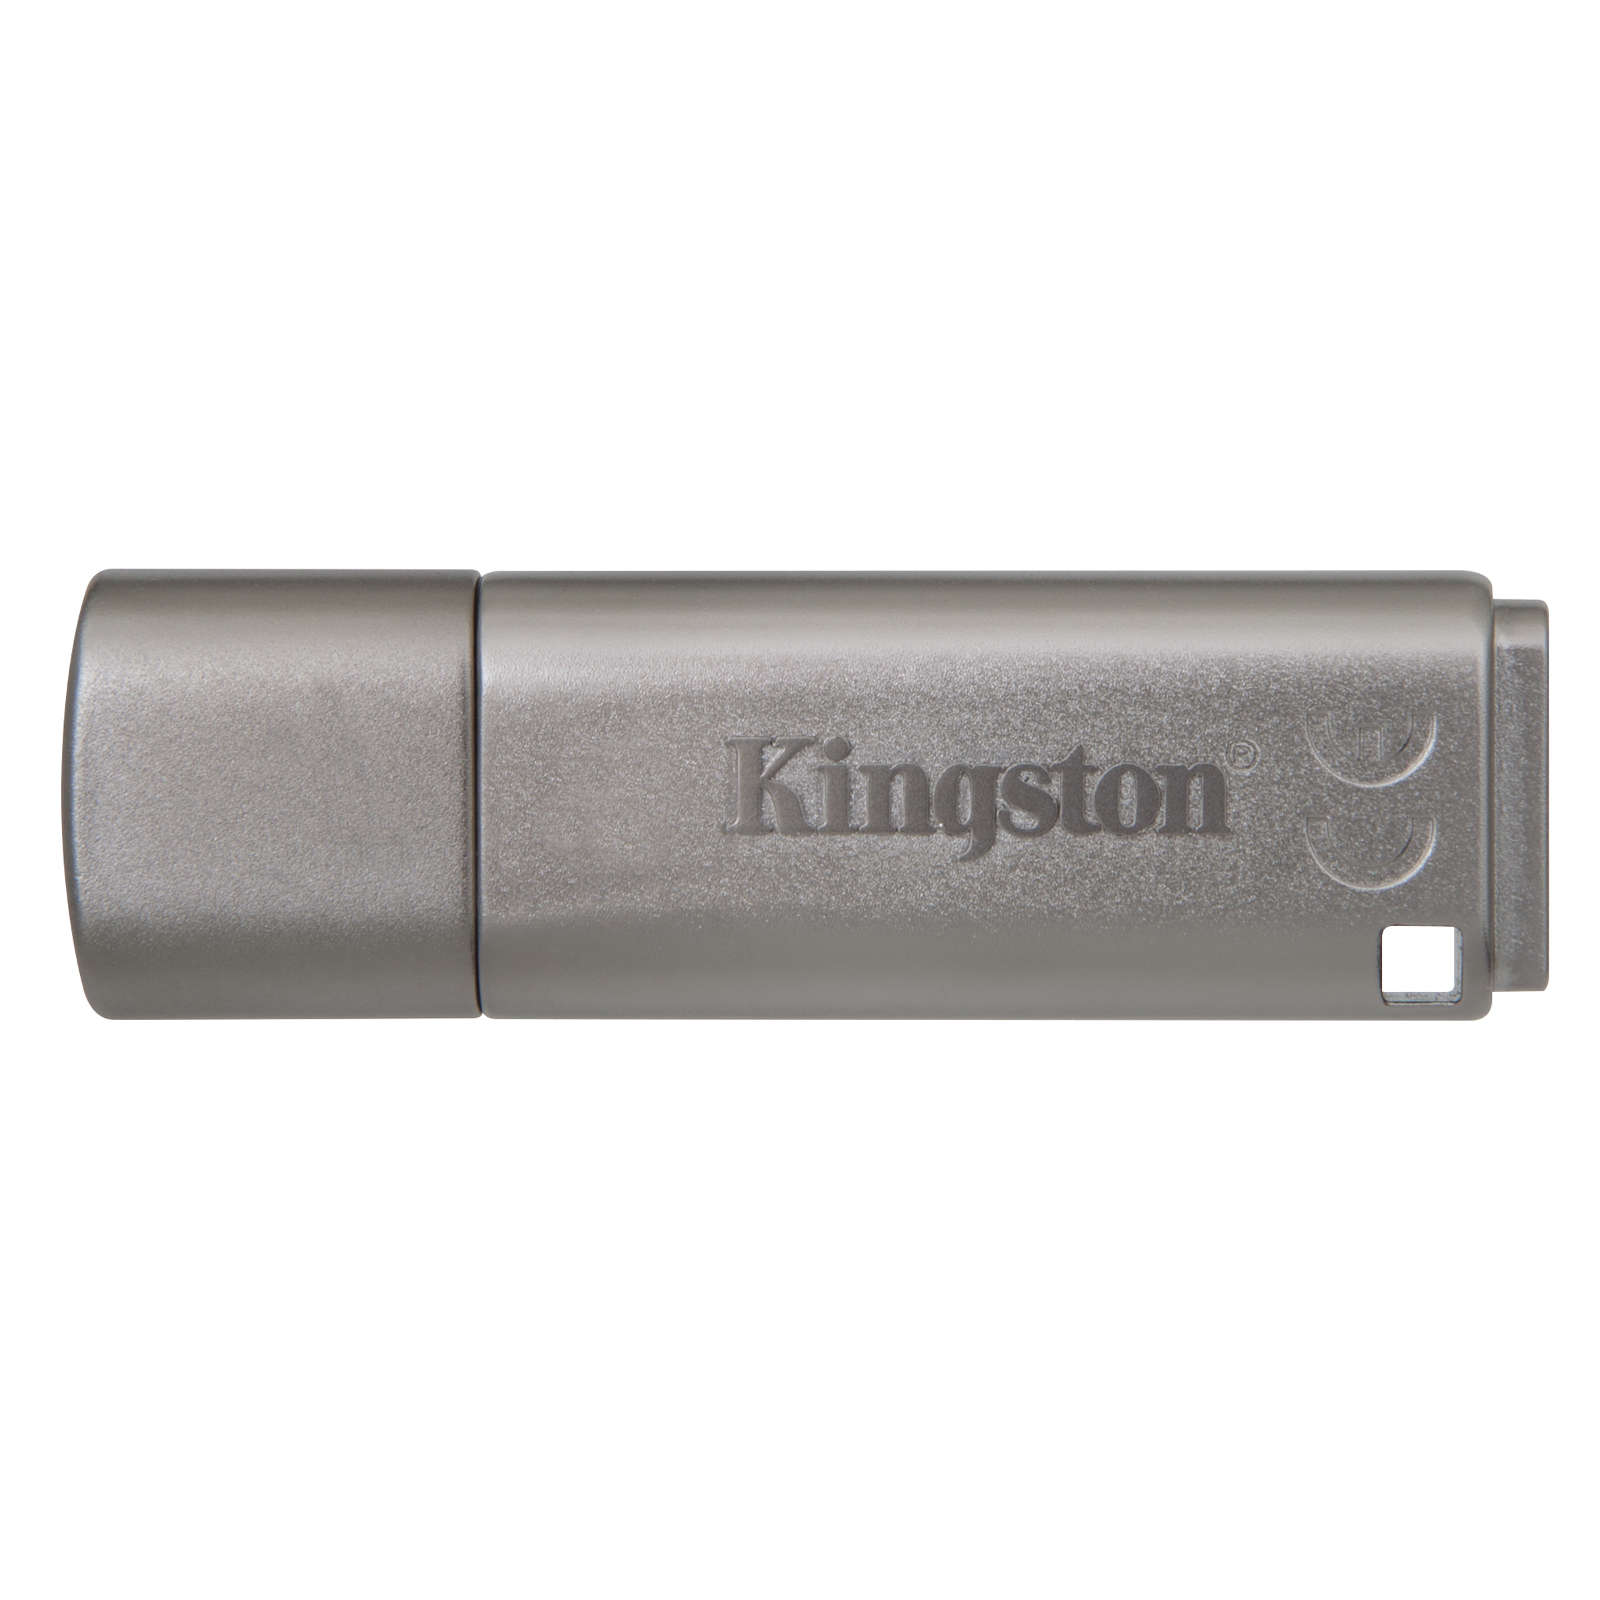 Clé USB Kingston DataTraveler Locker+ G3 - 16 Go Clé USB sécurisé 16 Go USB 3.0 (garantie constructeur 5 ans)